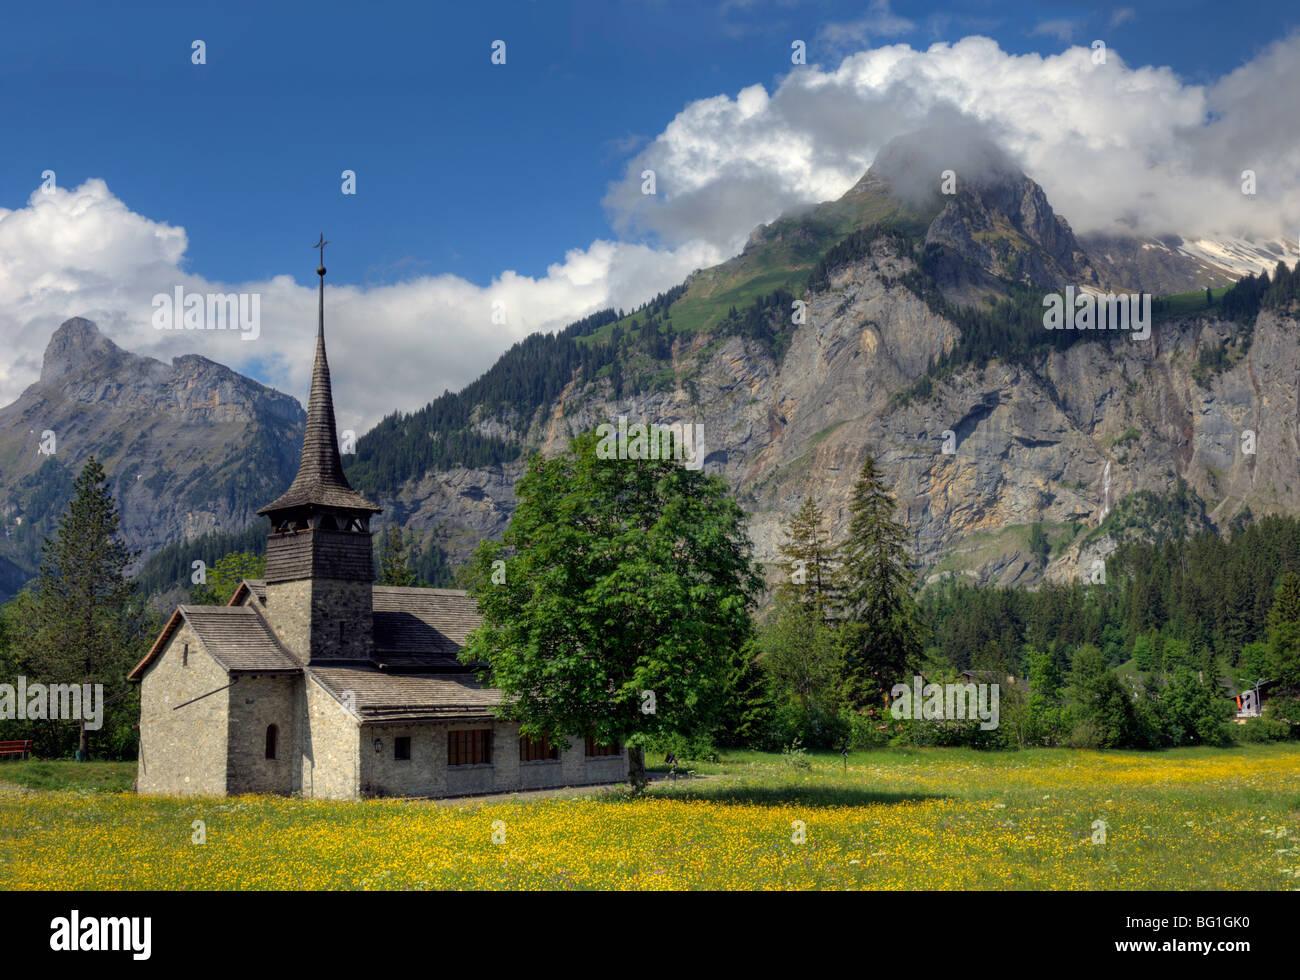 Kandersteg in the Canton of Bern,Switzerland - Stock Image